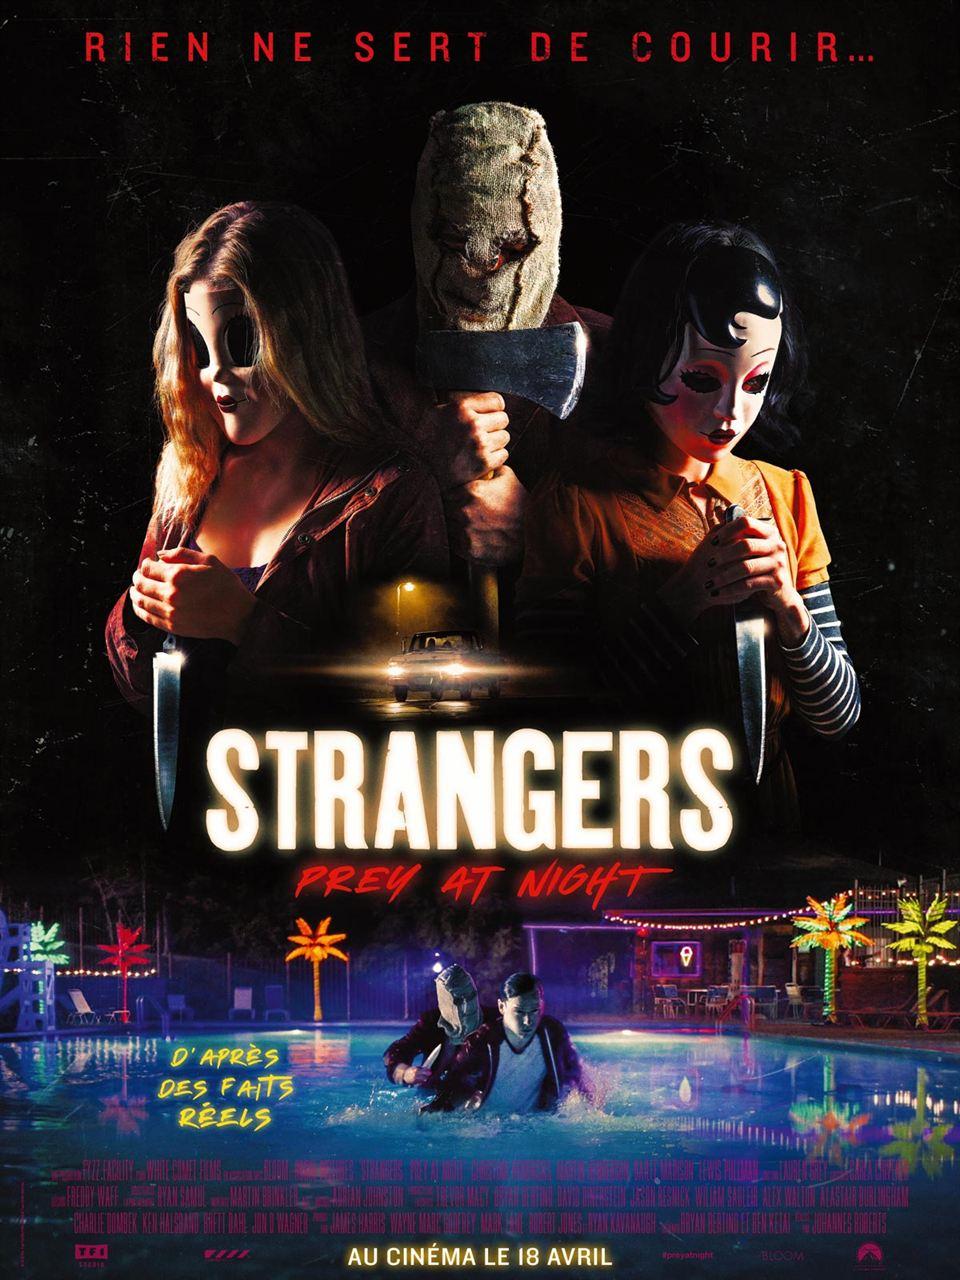 Strangers prey at night au cin ma limoges ester grand ecran - Cinema grand ecran limoges ...